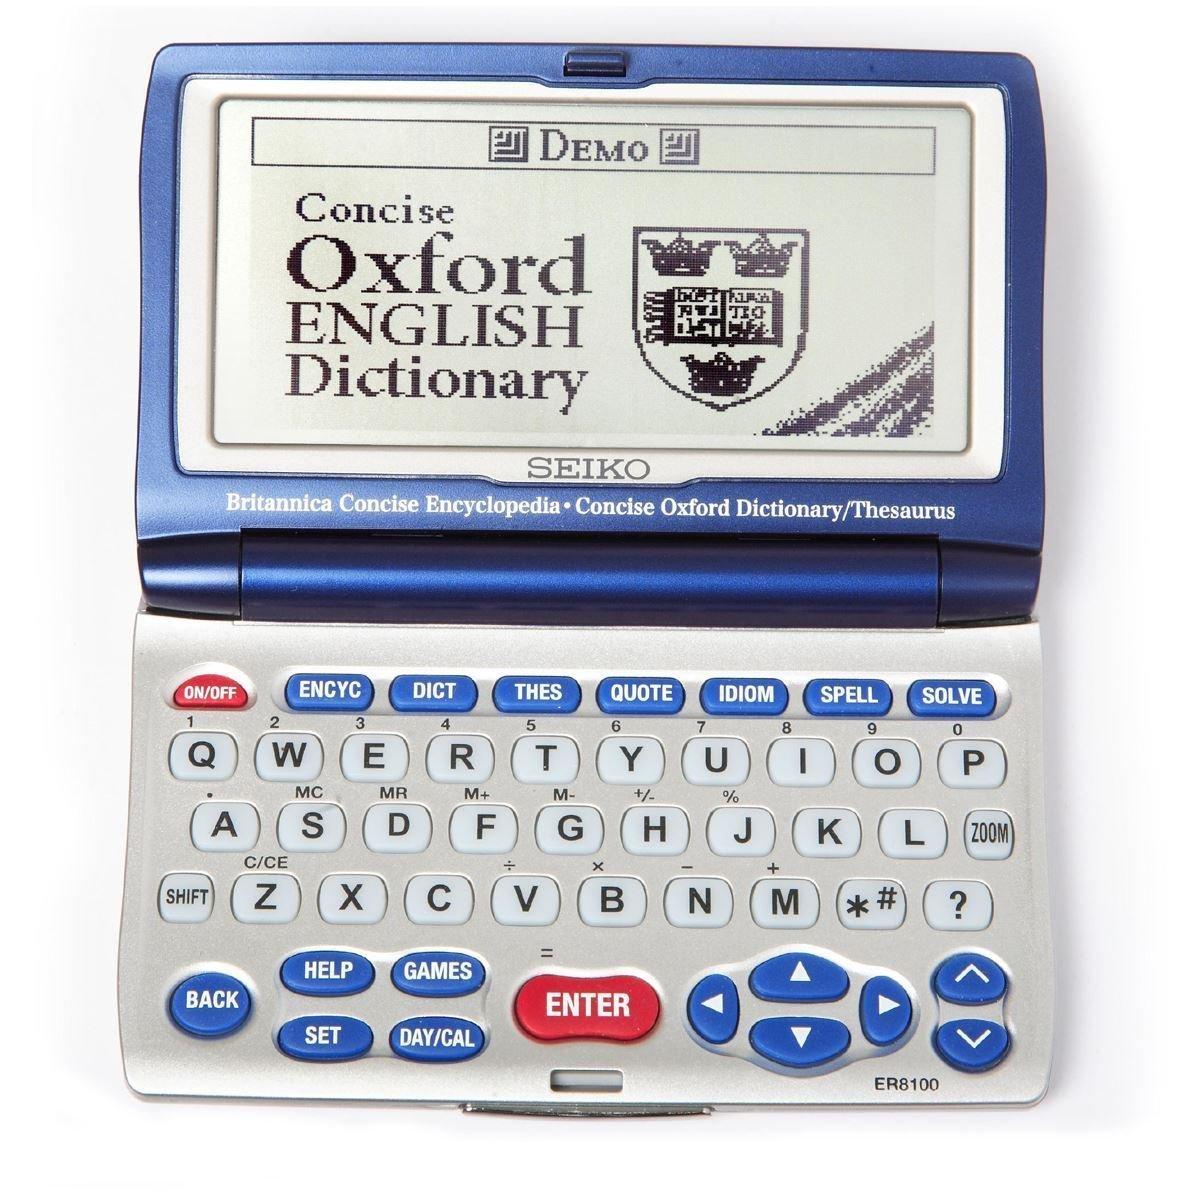 Seiko ER8100 Britannica & Oxford Encycolpedia Dictionary Thesaurus Spellchecker Silver / Blue Dimension 0.78x6x2 inches